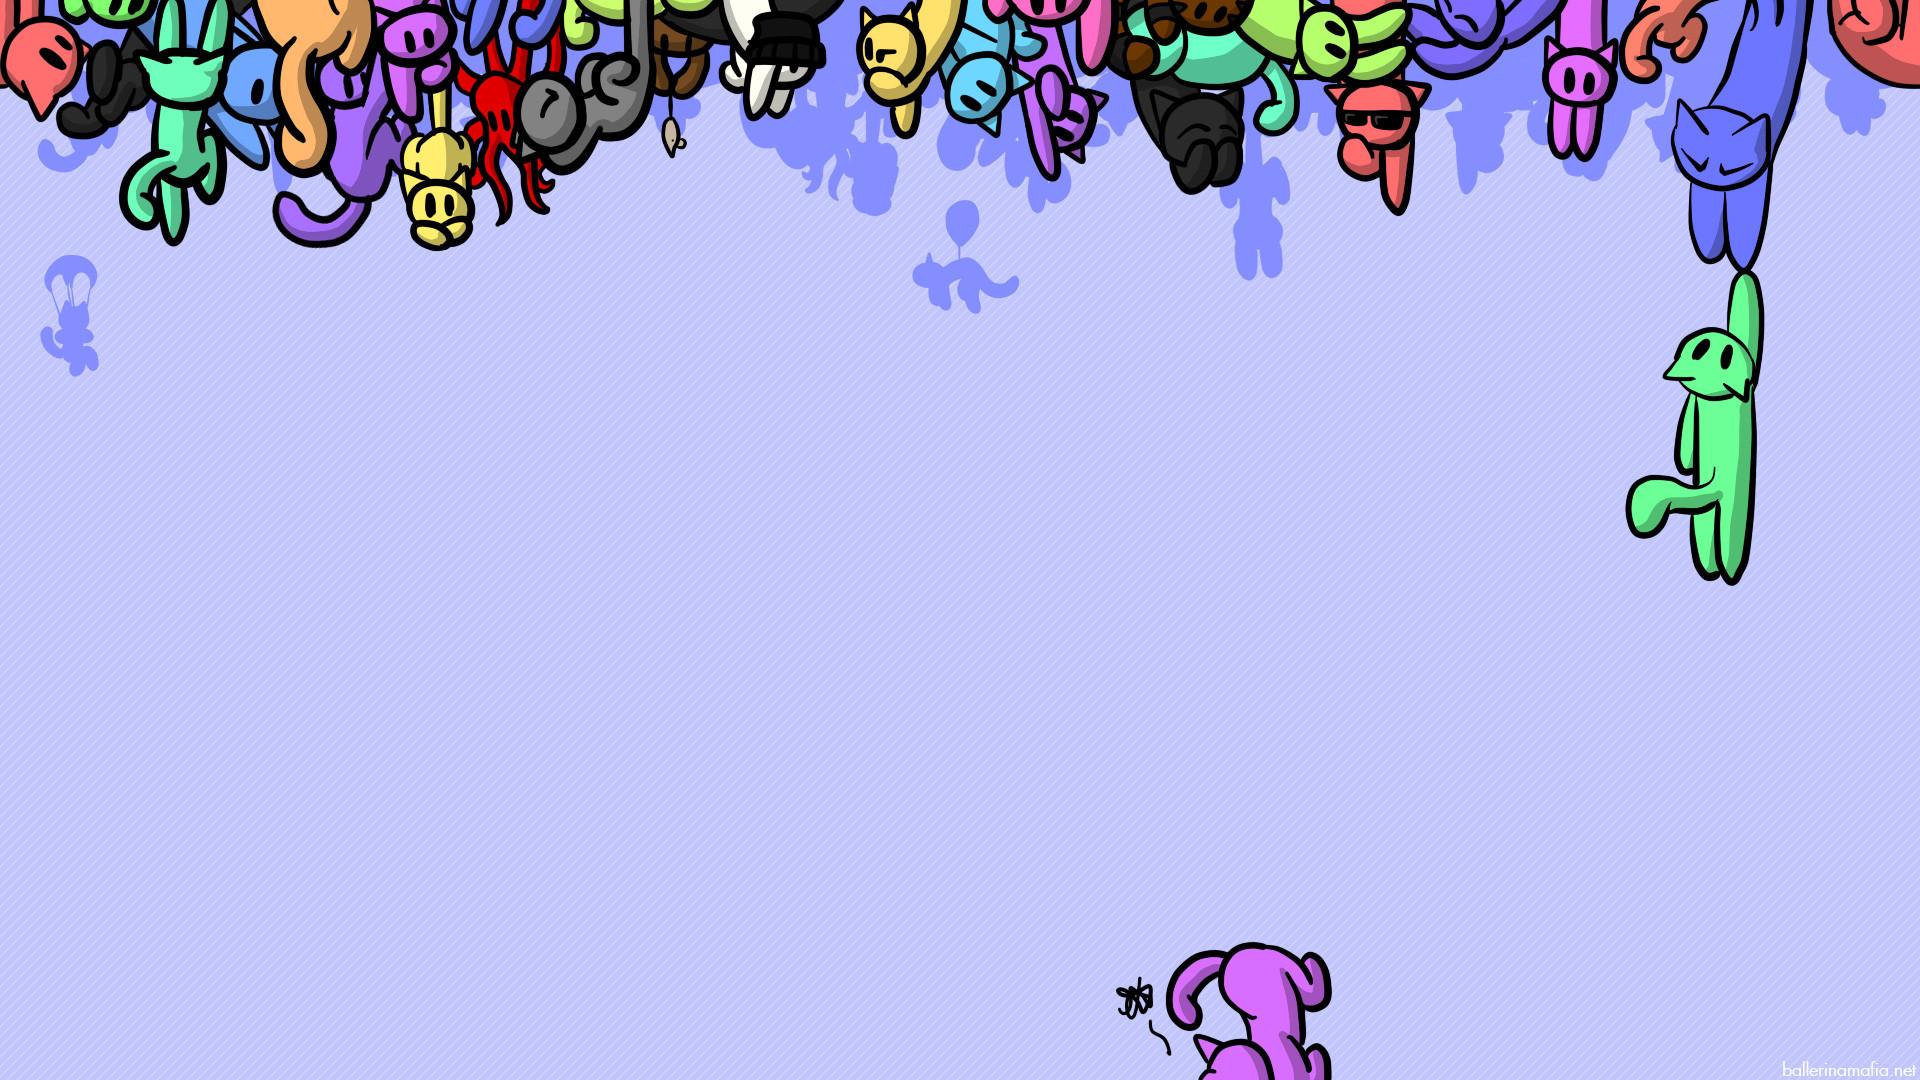 Funny Cartoon Wallpapers For Desktop 49 Images